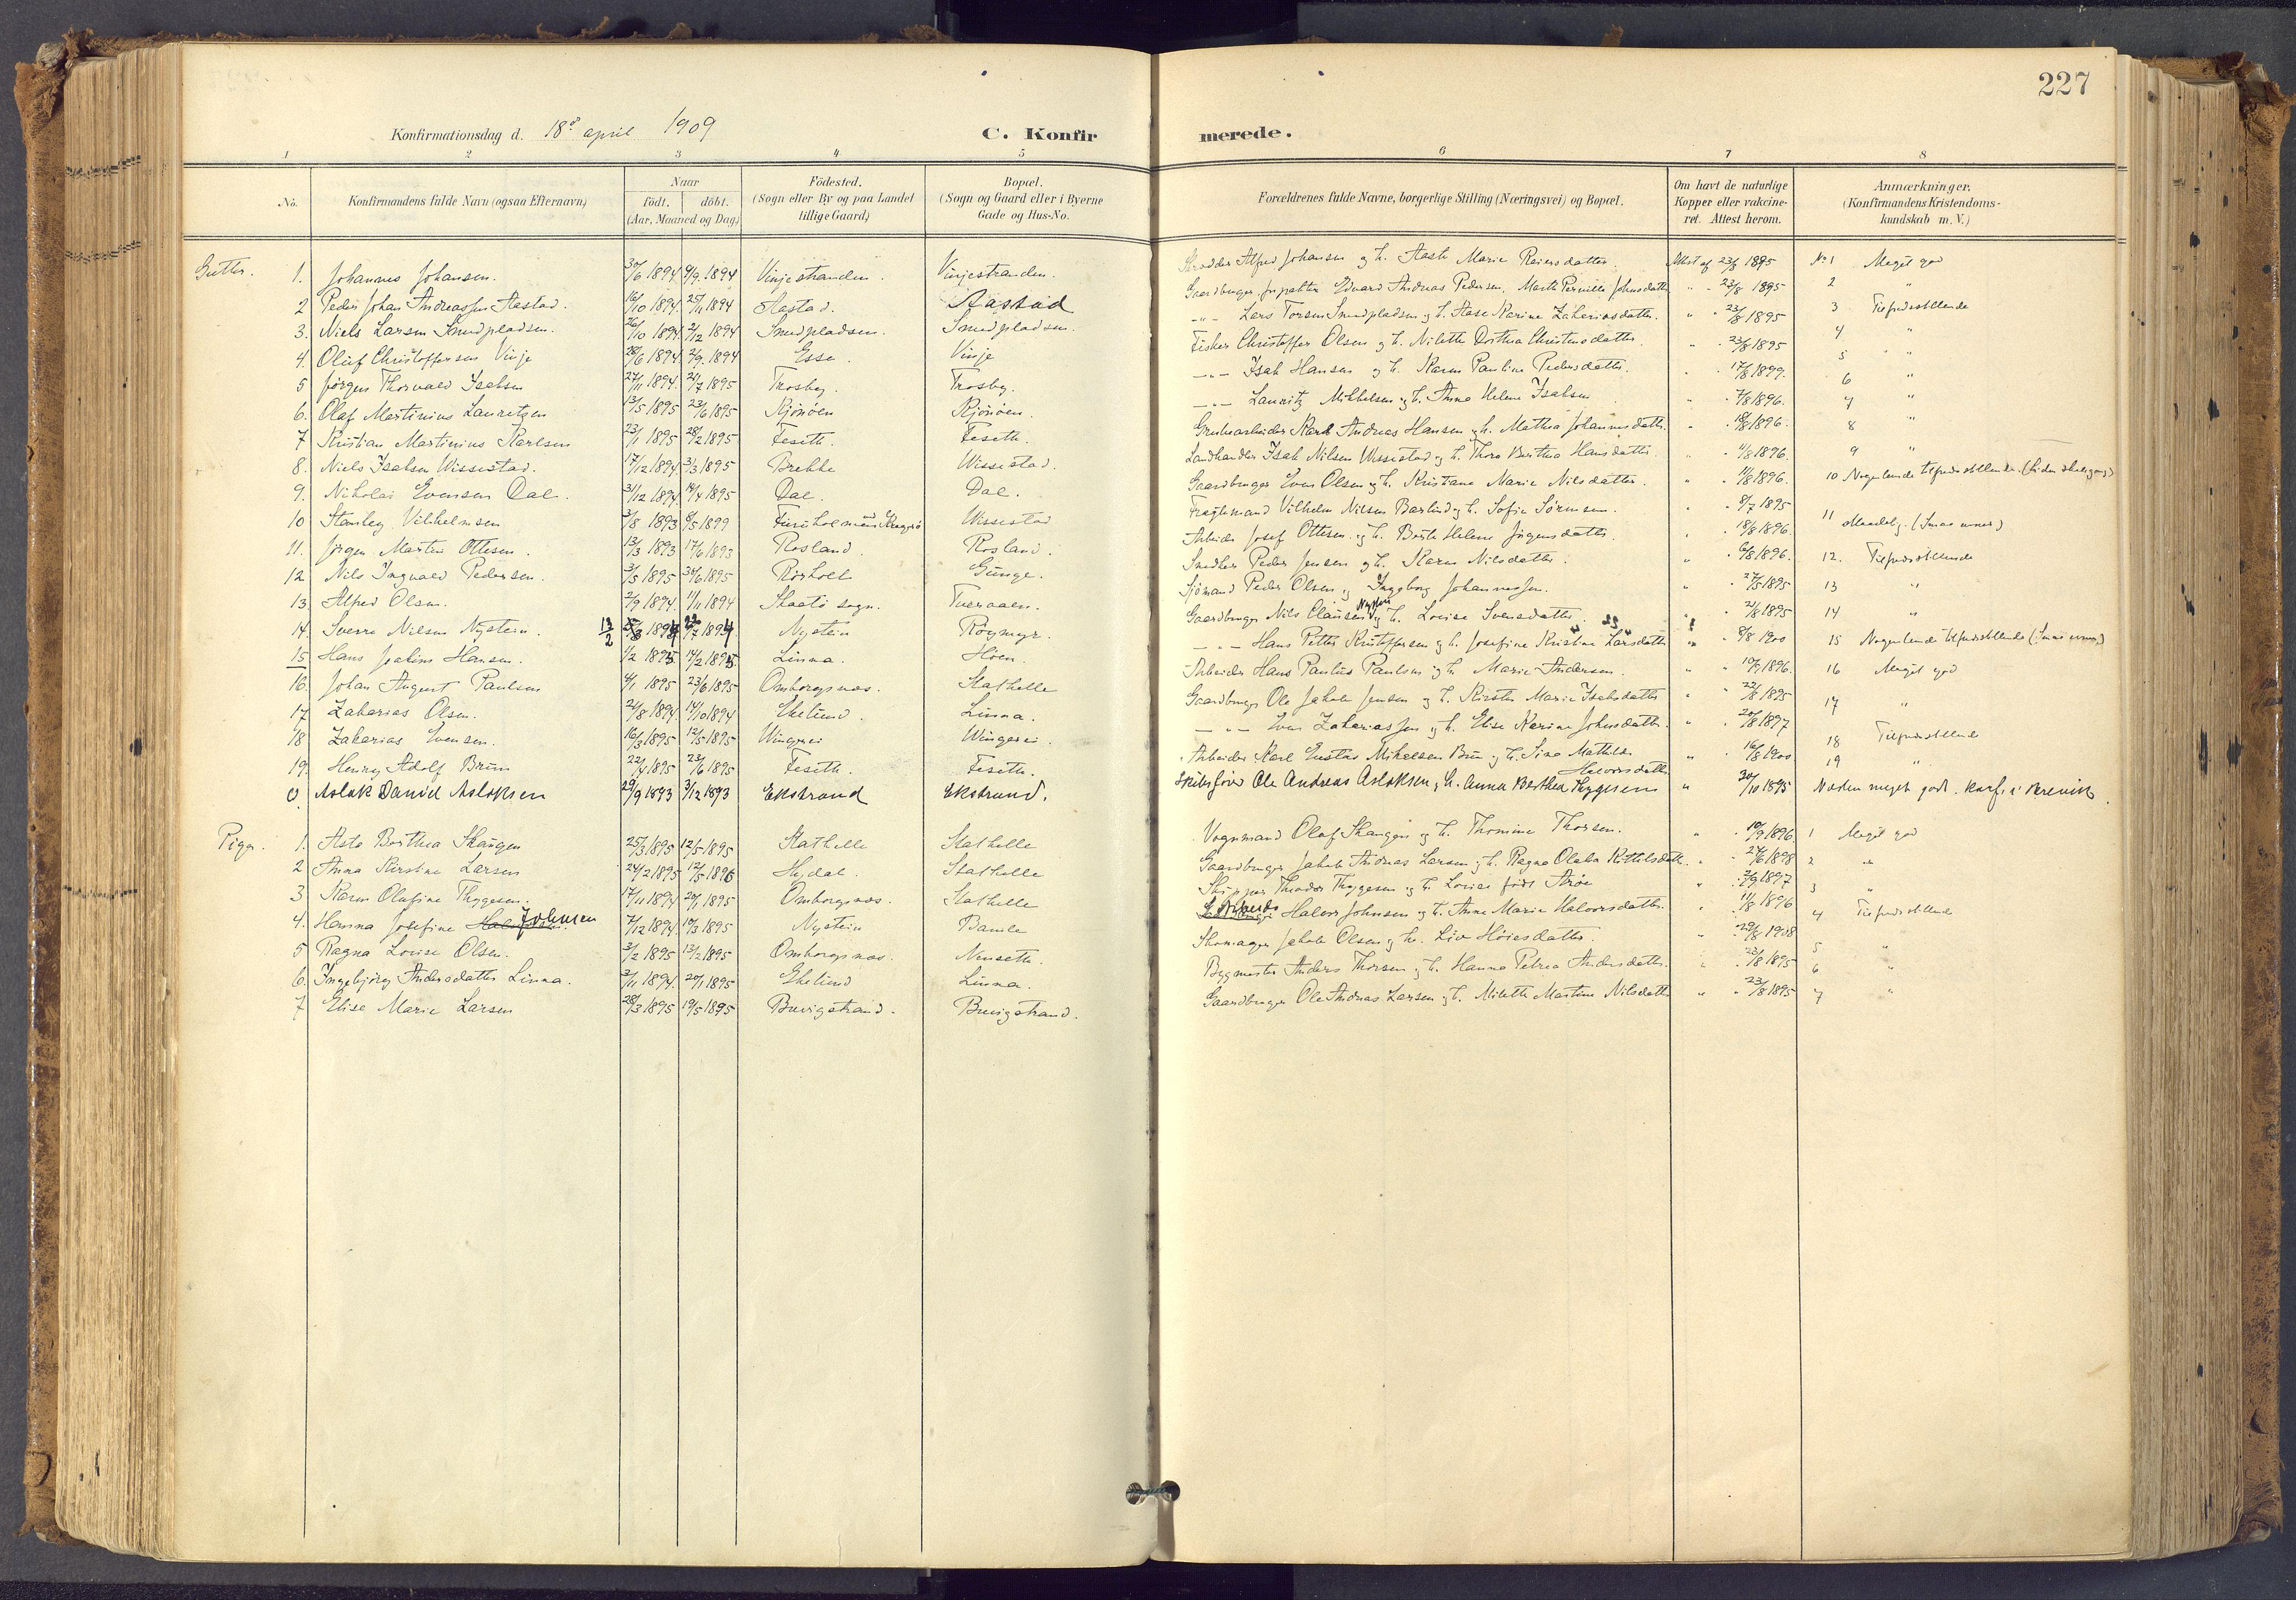 SAKO, Bamble kirkebøker, F/Fa/L0009: Ministerialbok nr. I 9, 1901-1917, s. 227